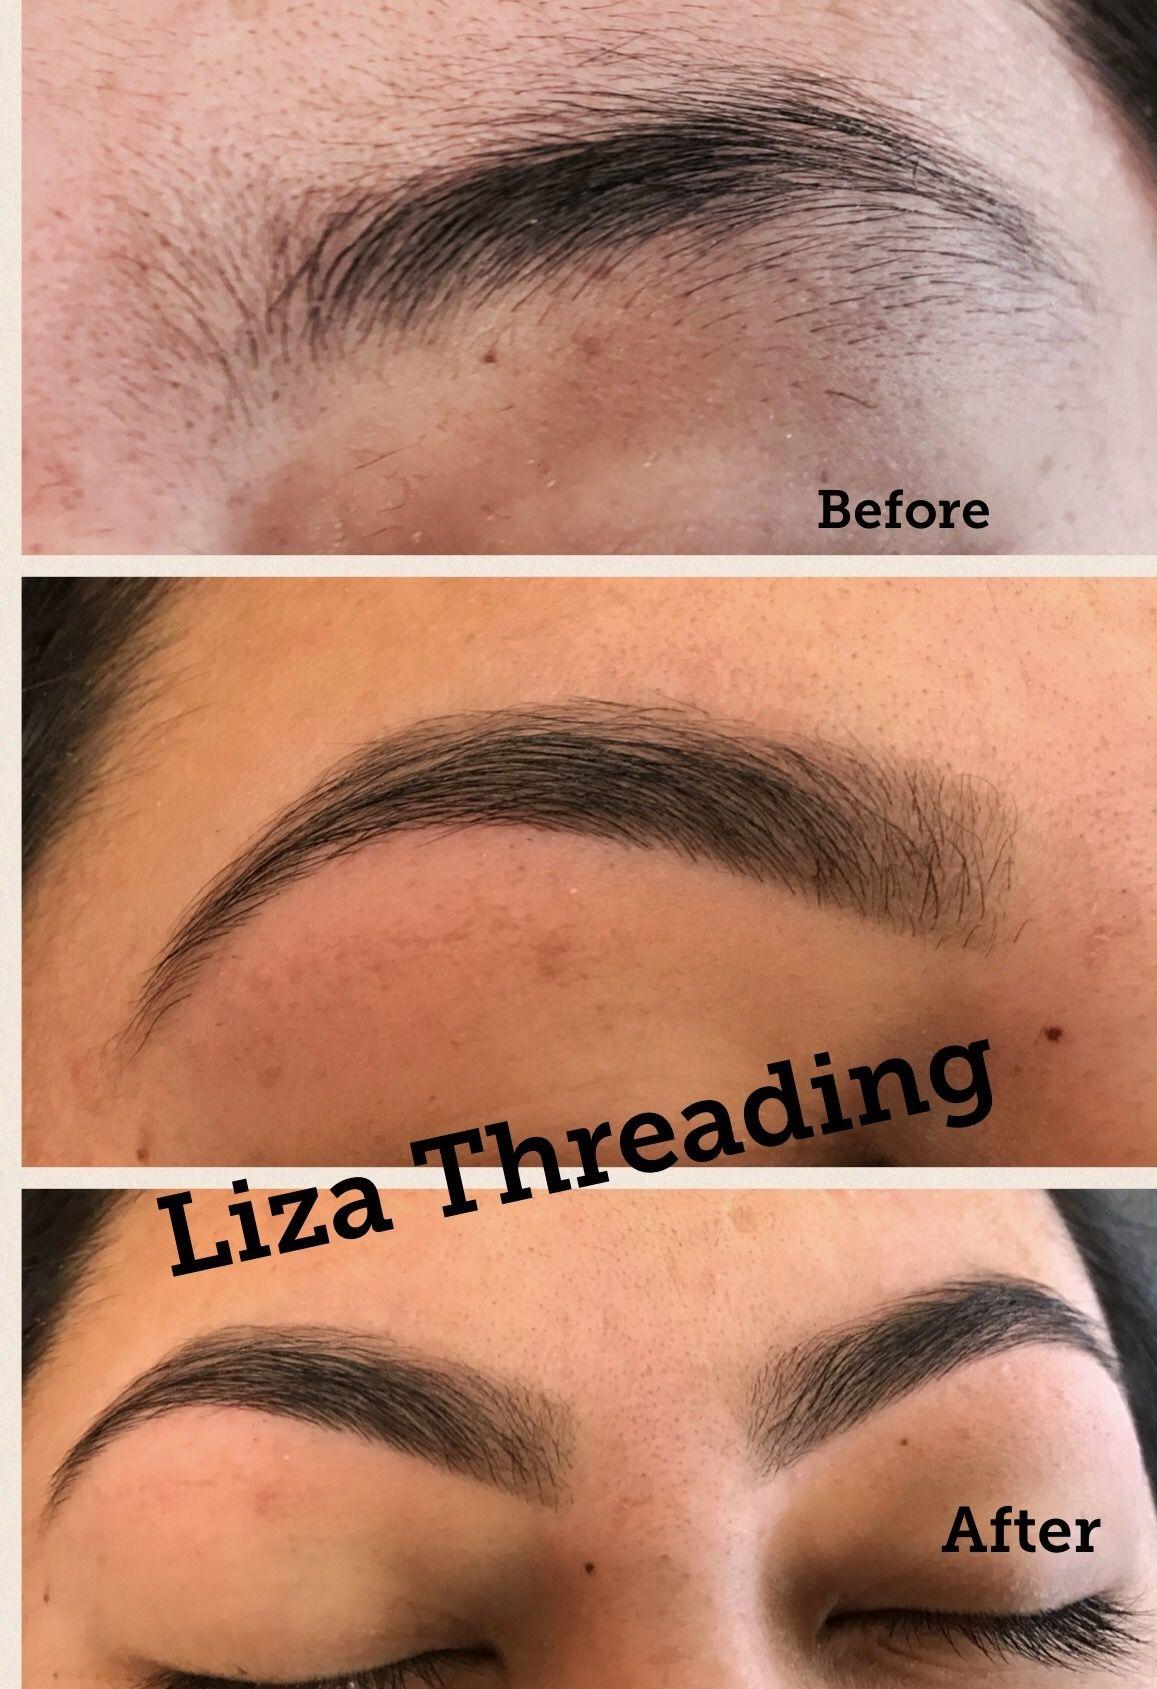 Pin By Liza Threading On Eyebrow Threading In Oxnard Pinterest